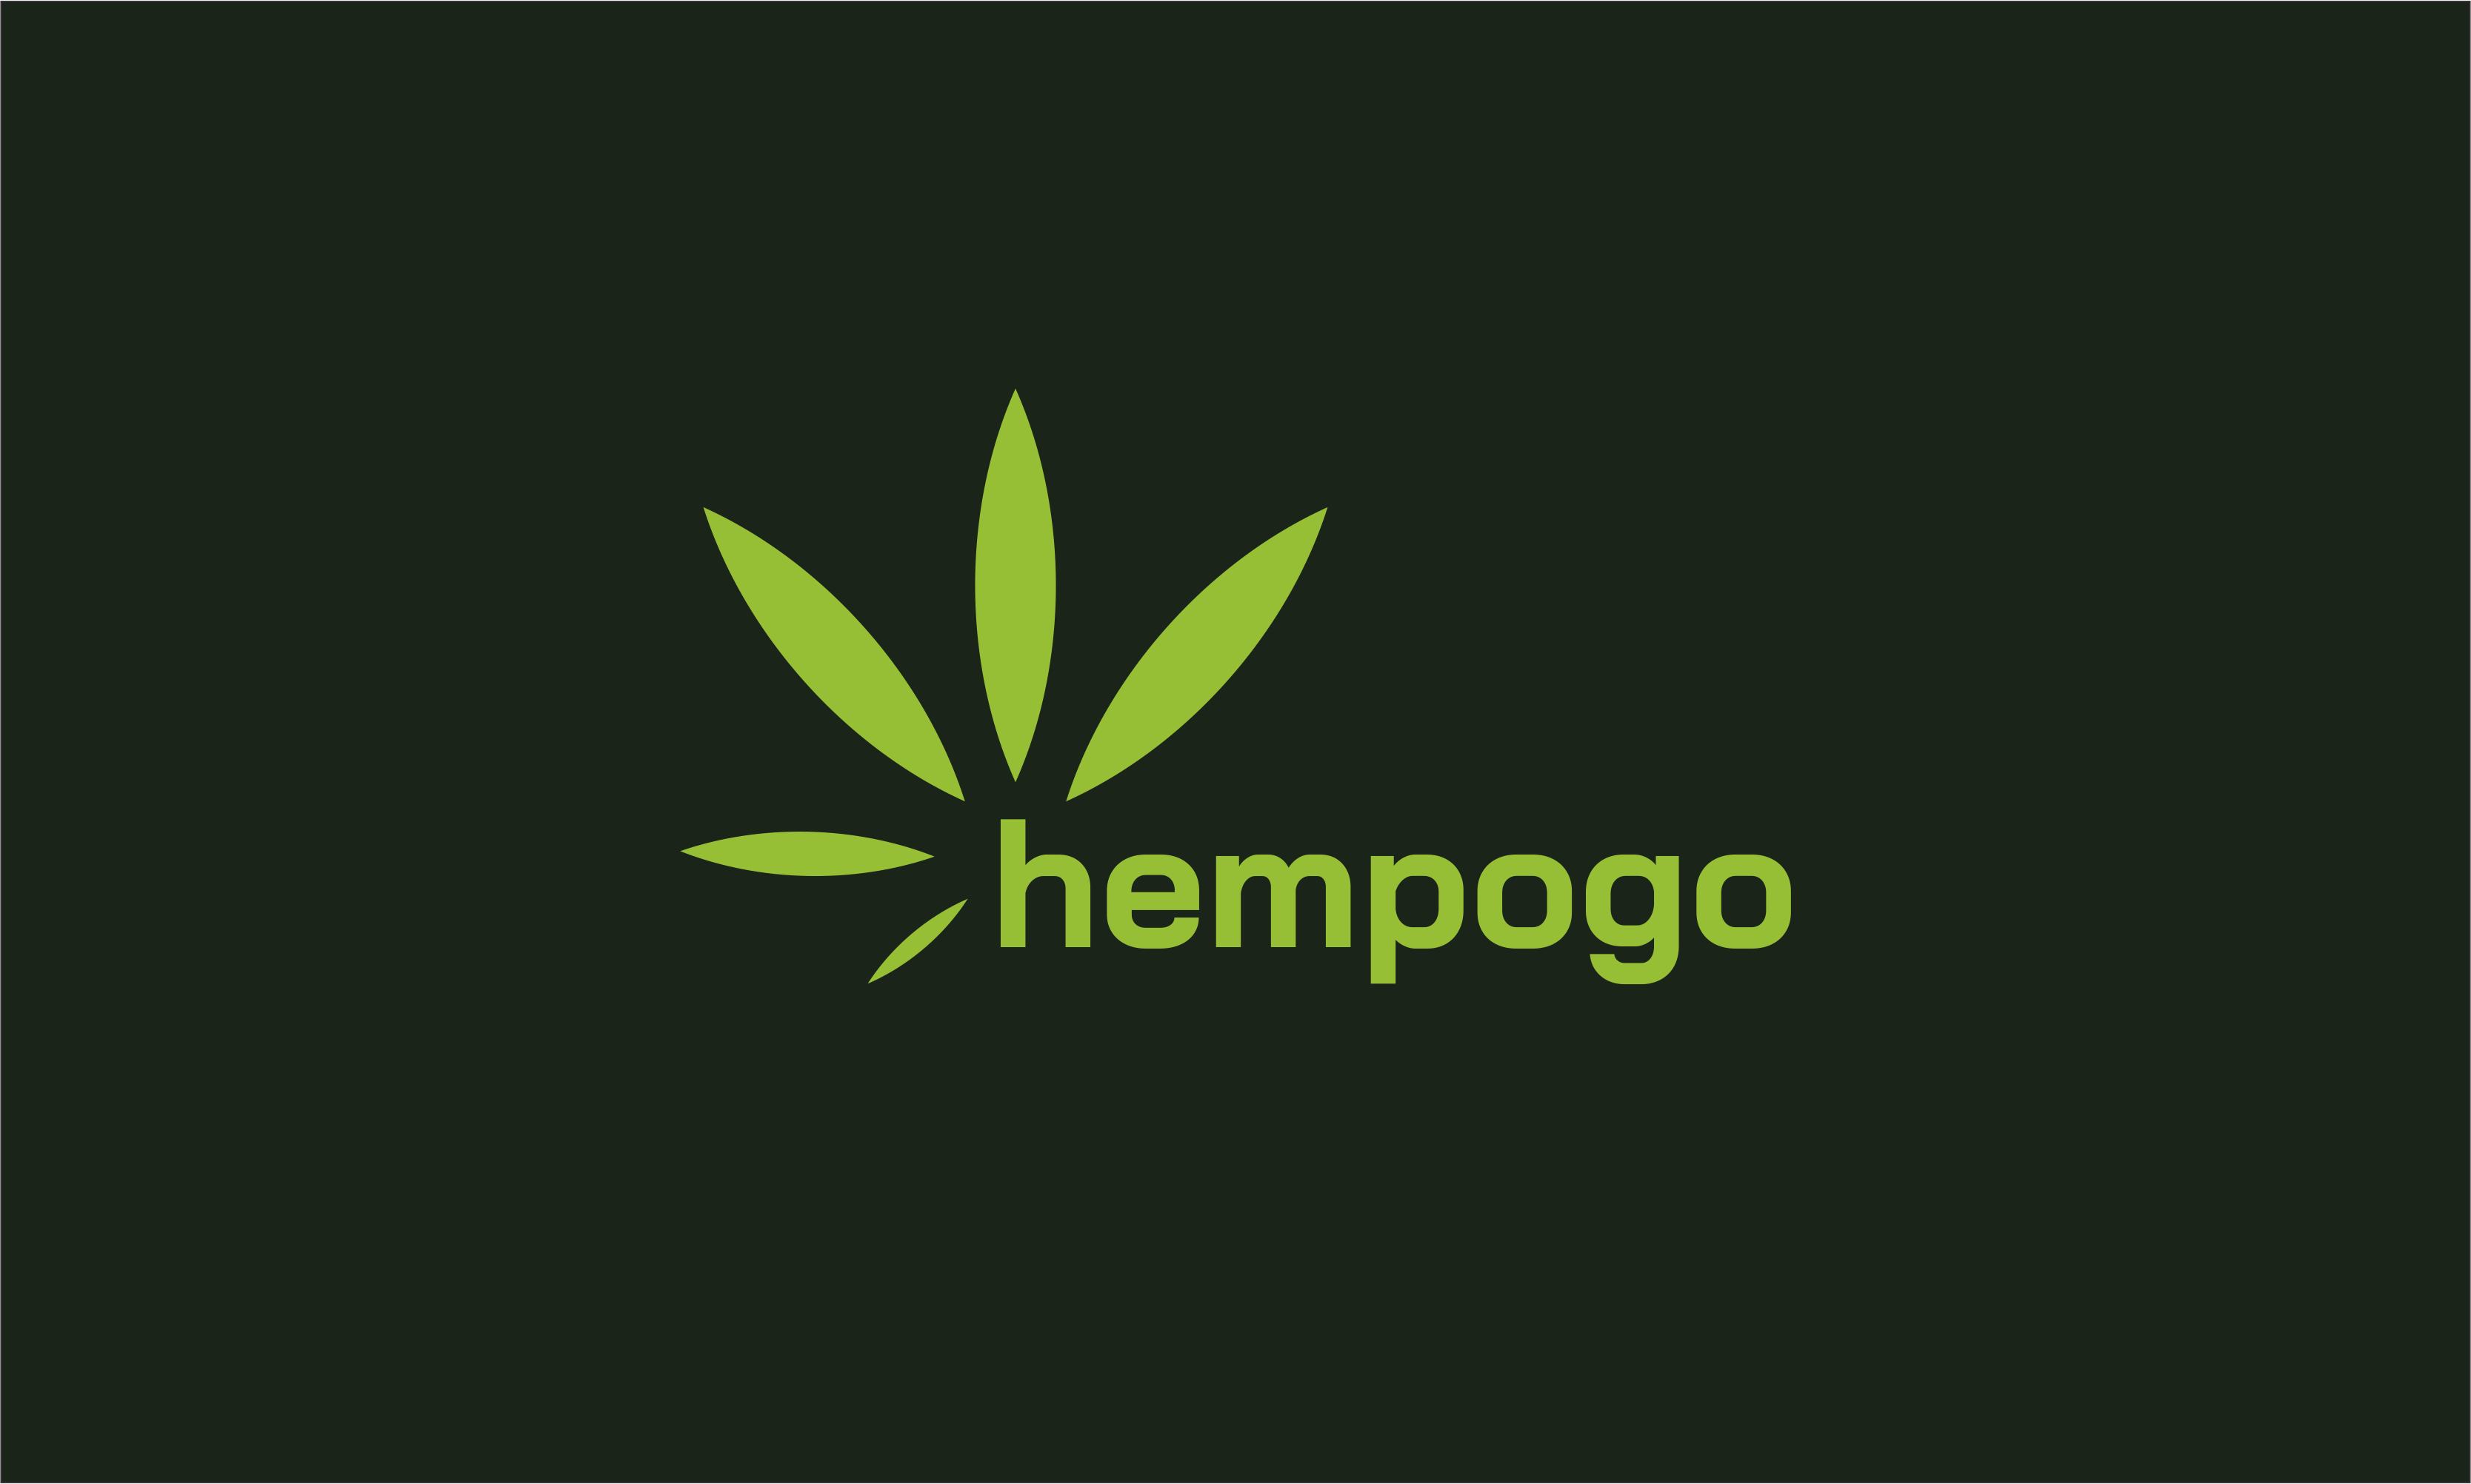 Hempogo